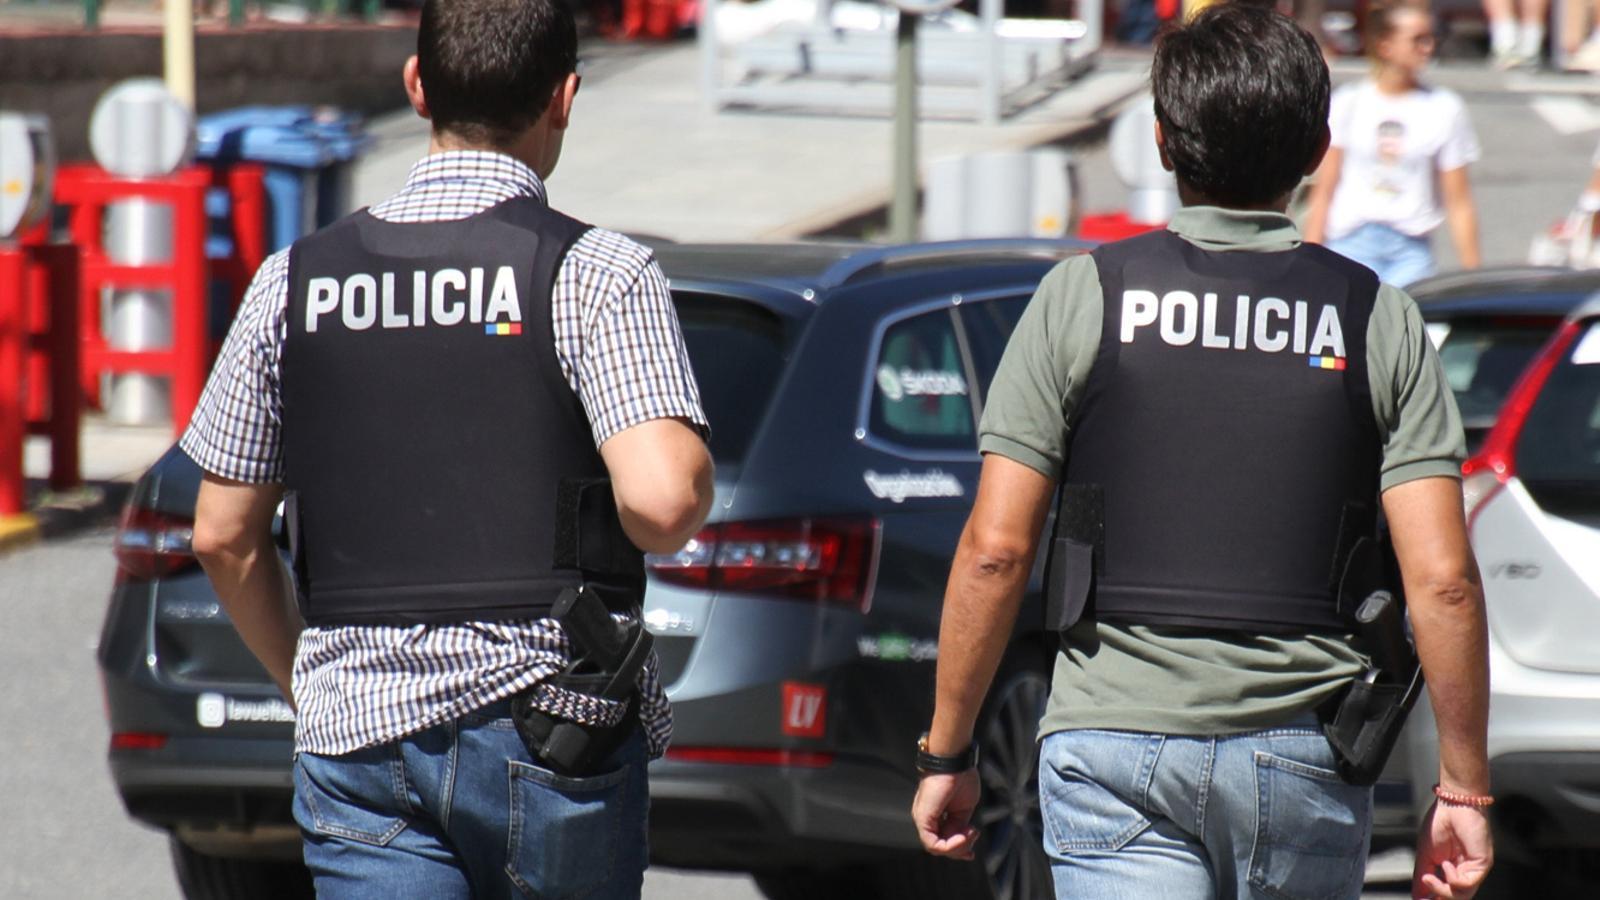 Dos agents de la policia. / TWITTER POLICIA D'ANDORRA